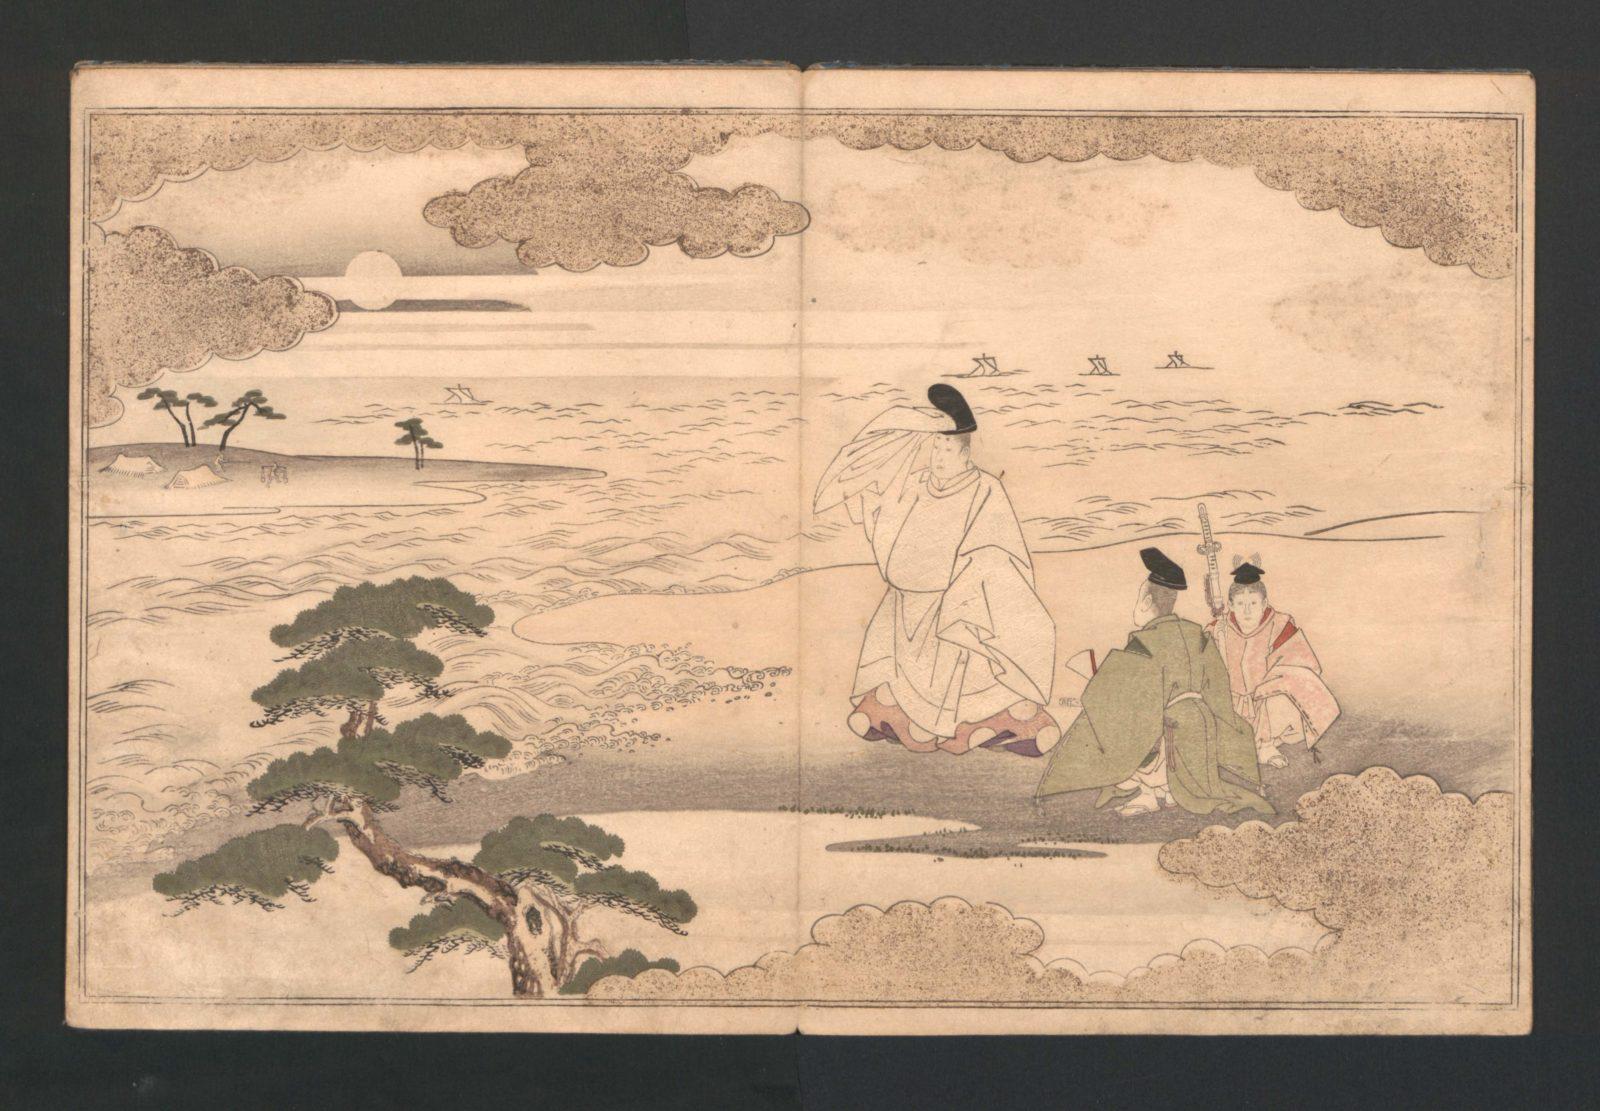 The Moon-Mad Monk, or Crazy Gazing at the Moon (Kyōgetsubō)